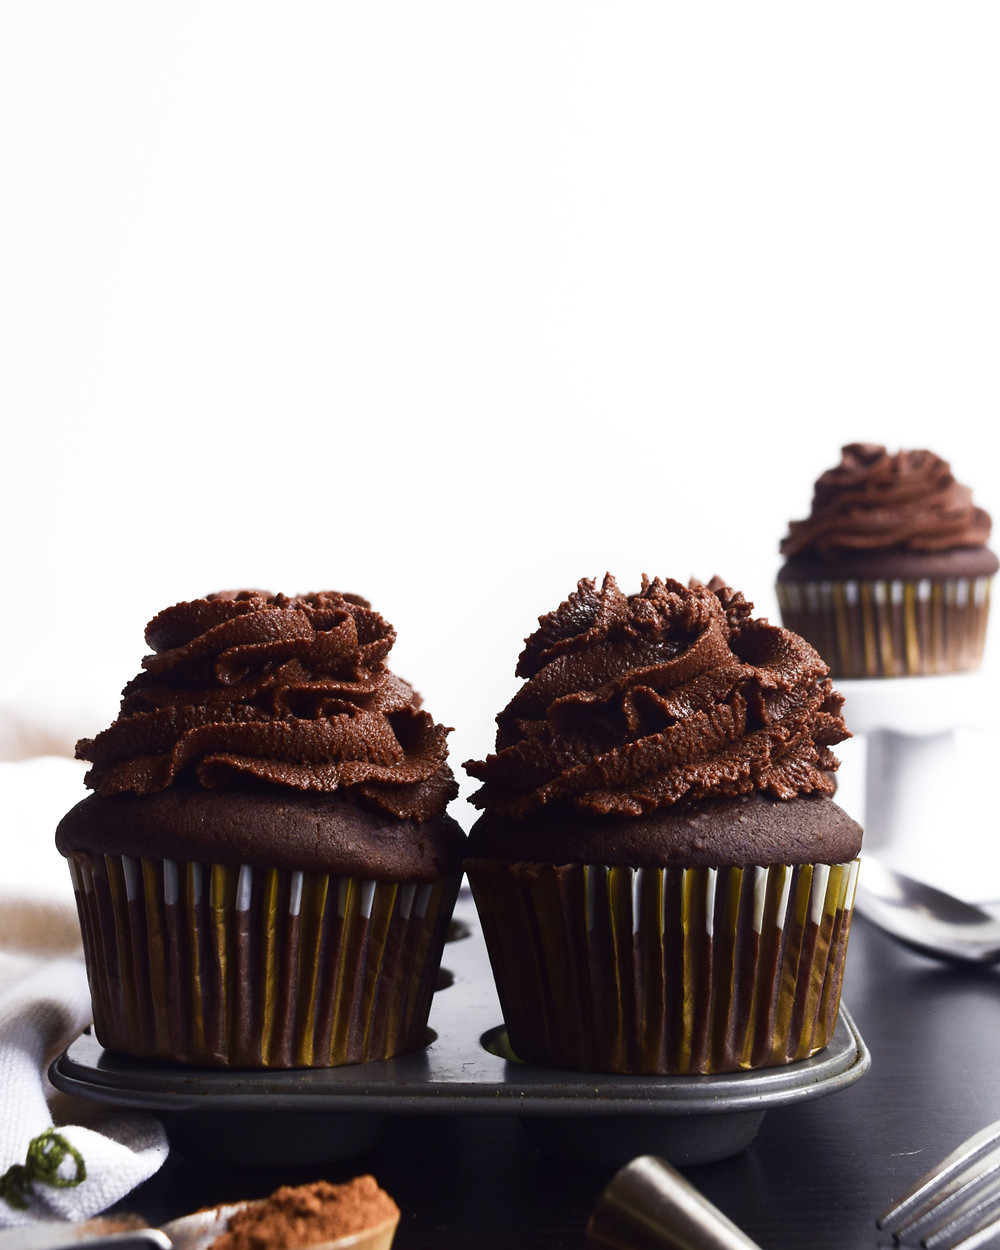 Best Vegan Chocolate Cupcakes